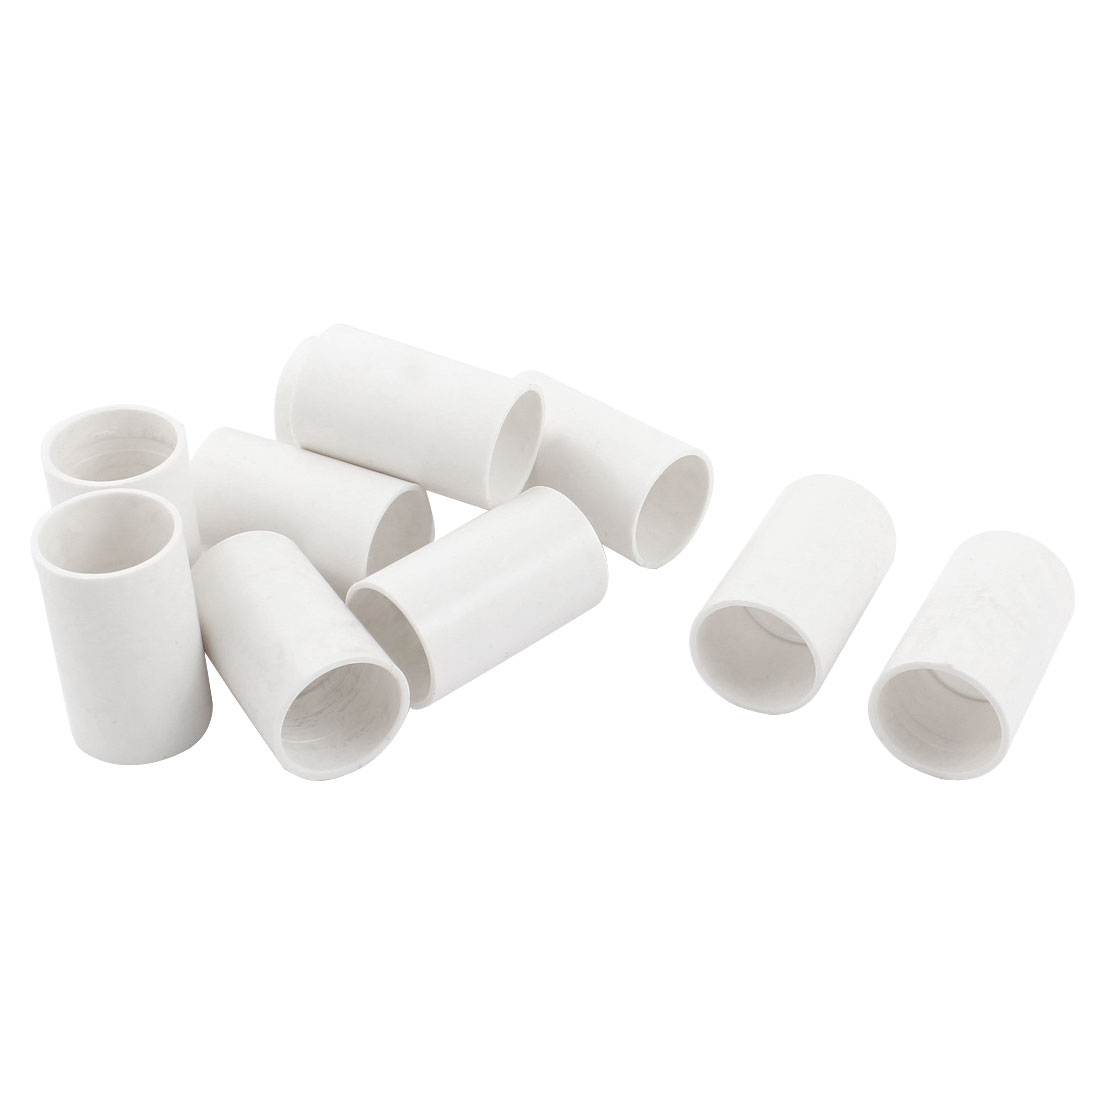 10 Pcs 25mm Inner Diameter Straight PVC Pipe Connectors Fittings White